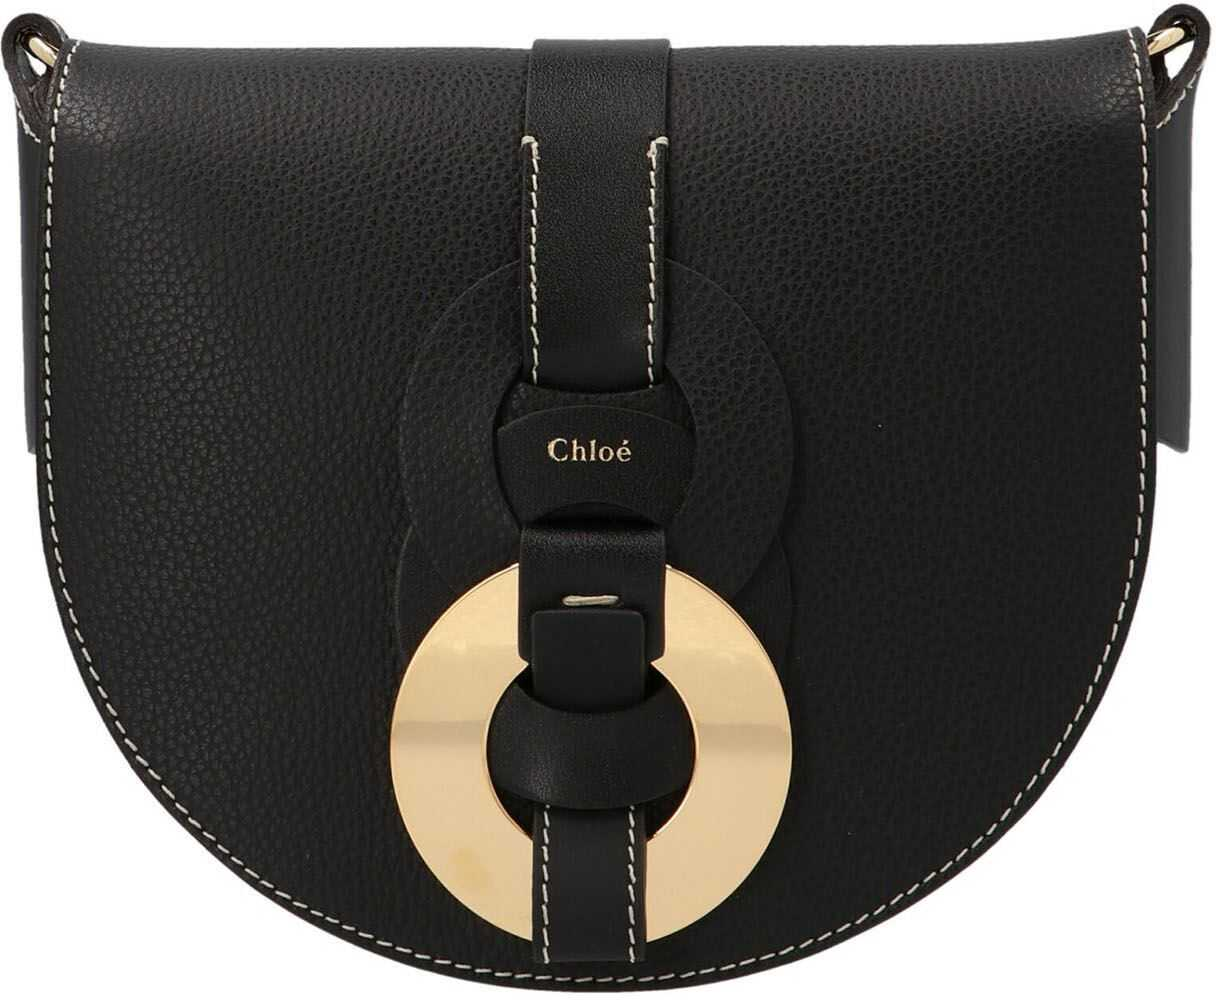 Chloe Darryl Small Bag In Black CHC21SS344C61001 Black imagine b-mall.ro